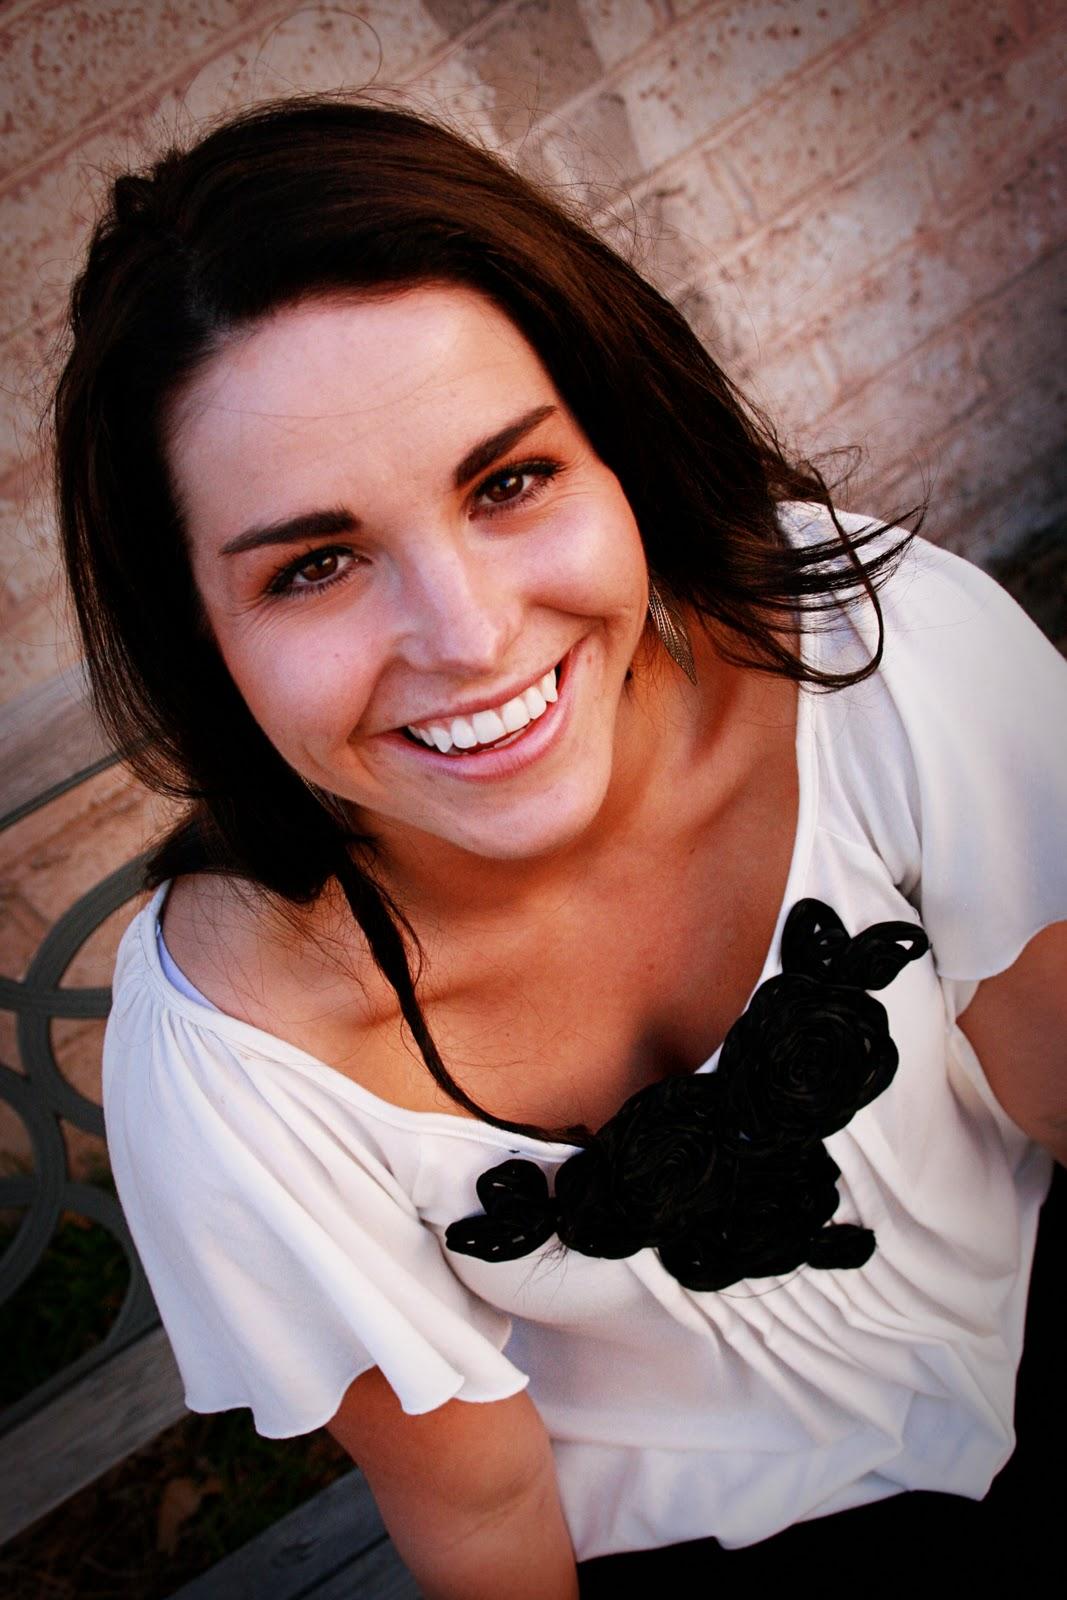 Shelbynicolephotography blogspot com kmack chelle for O garage corbeil